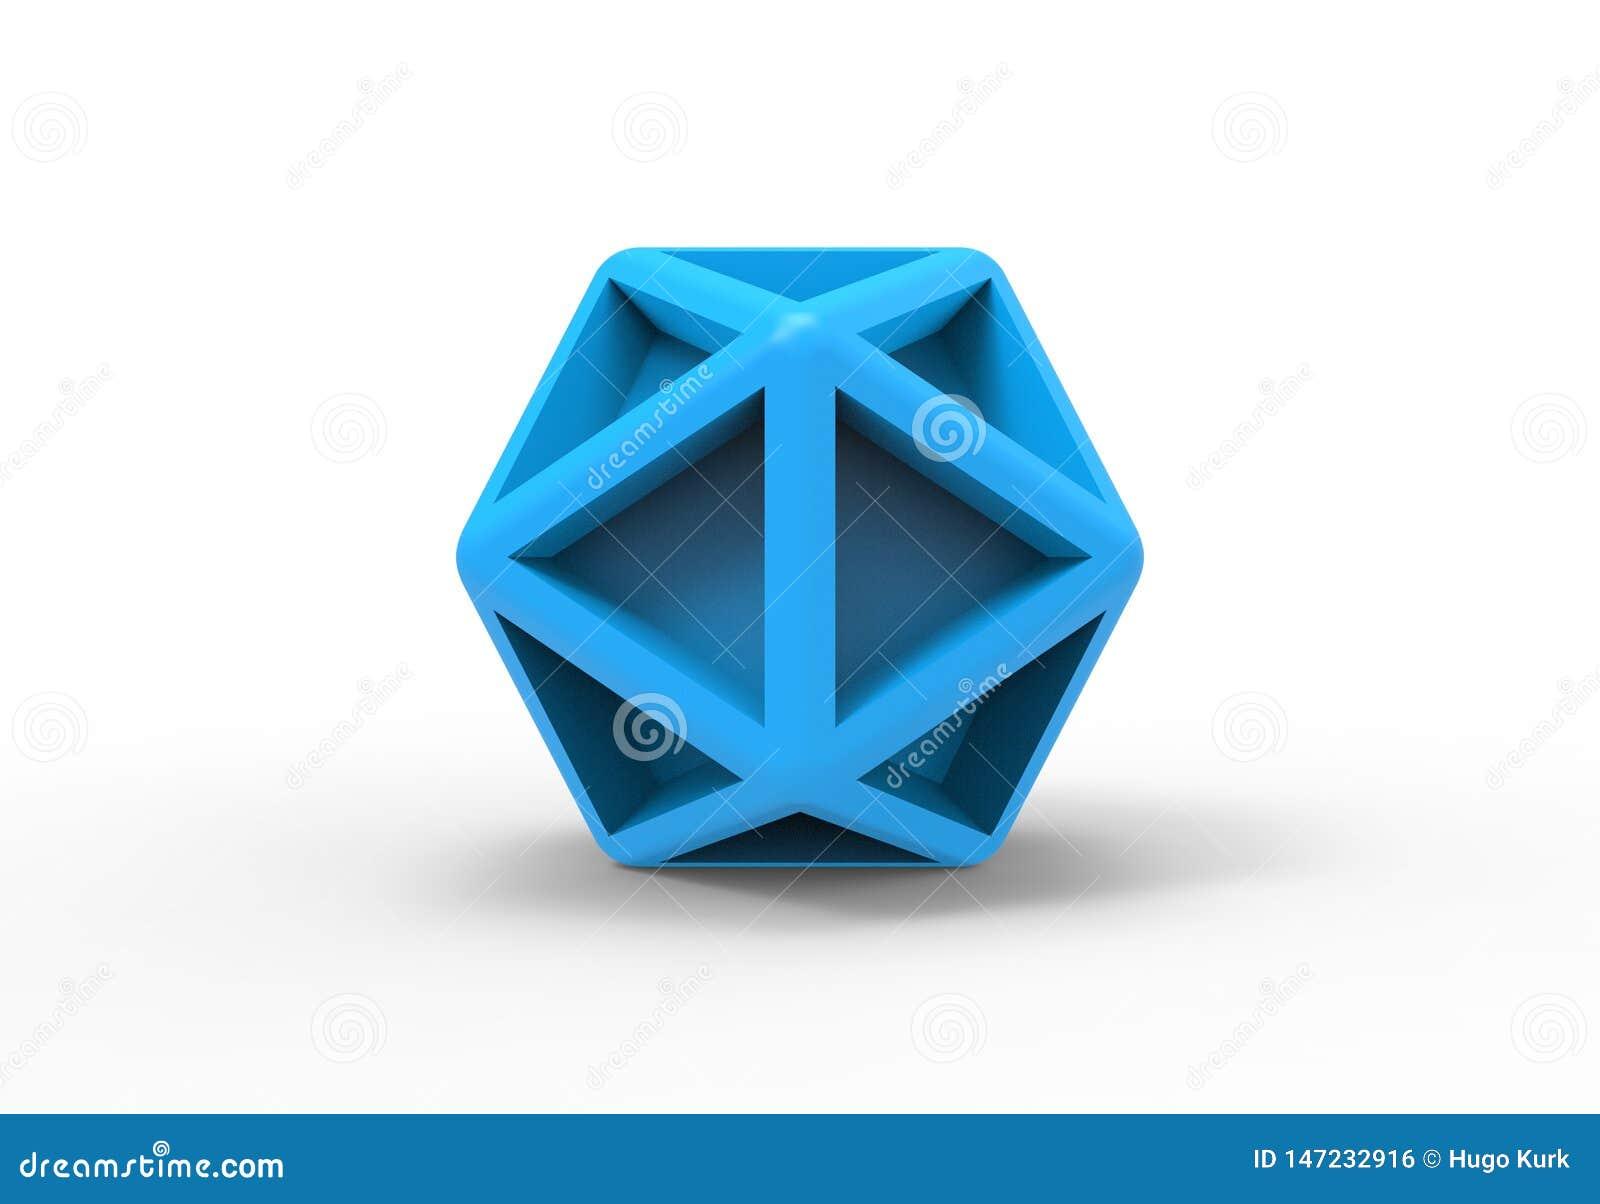 icosahedron geometric 3d object